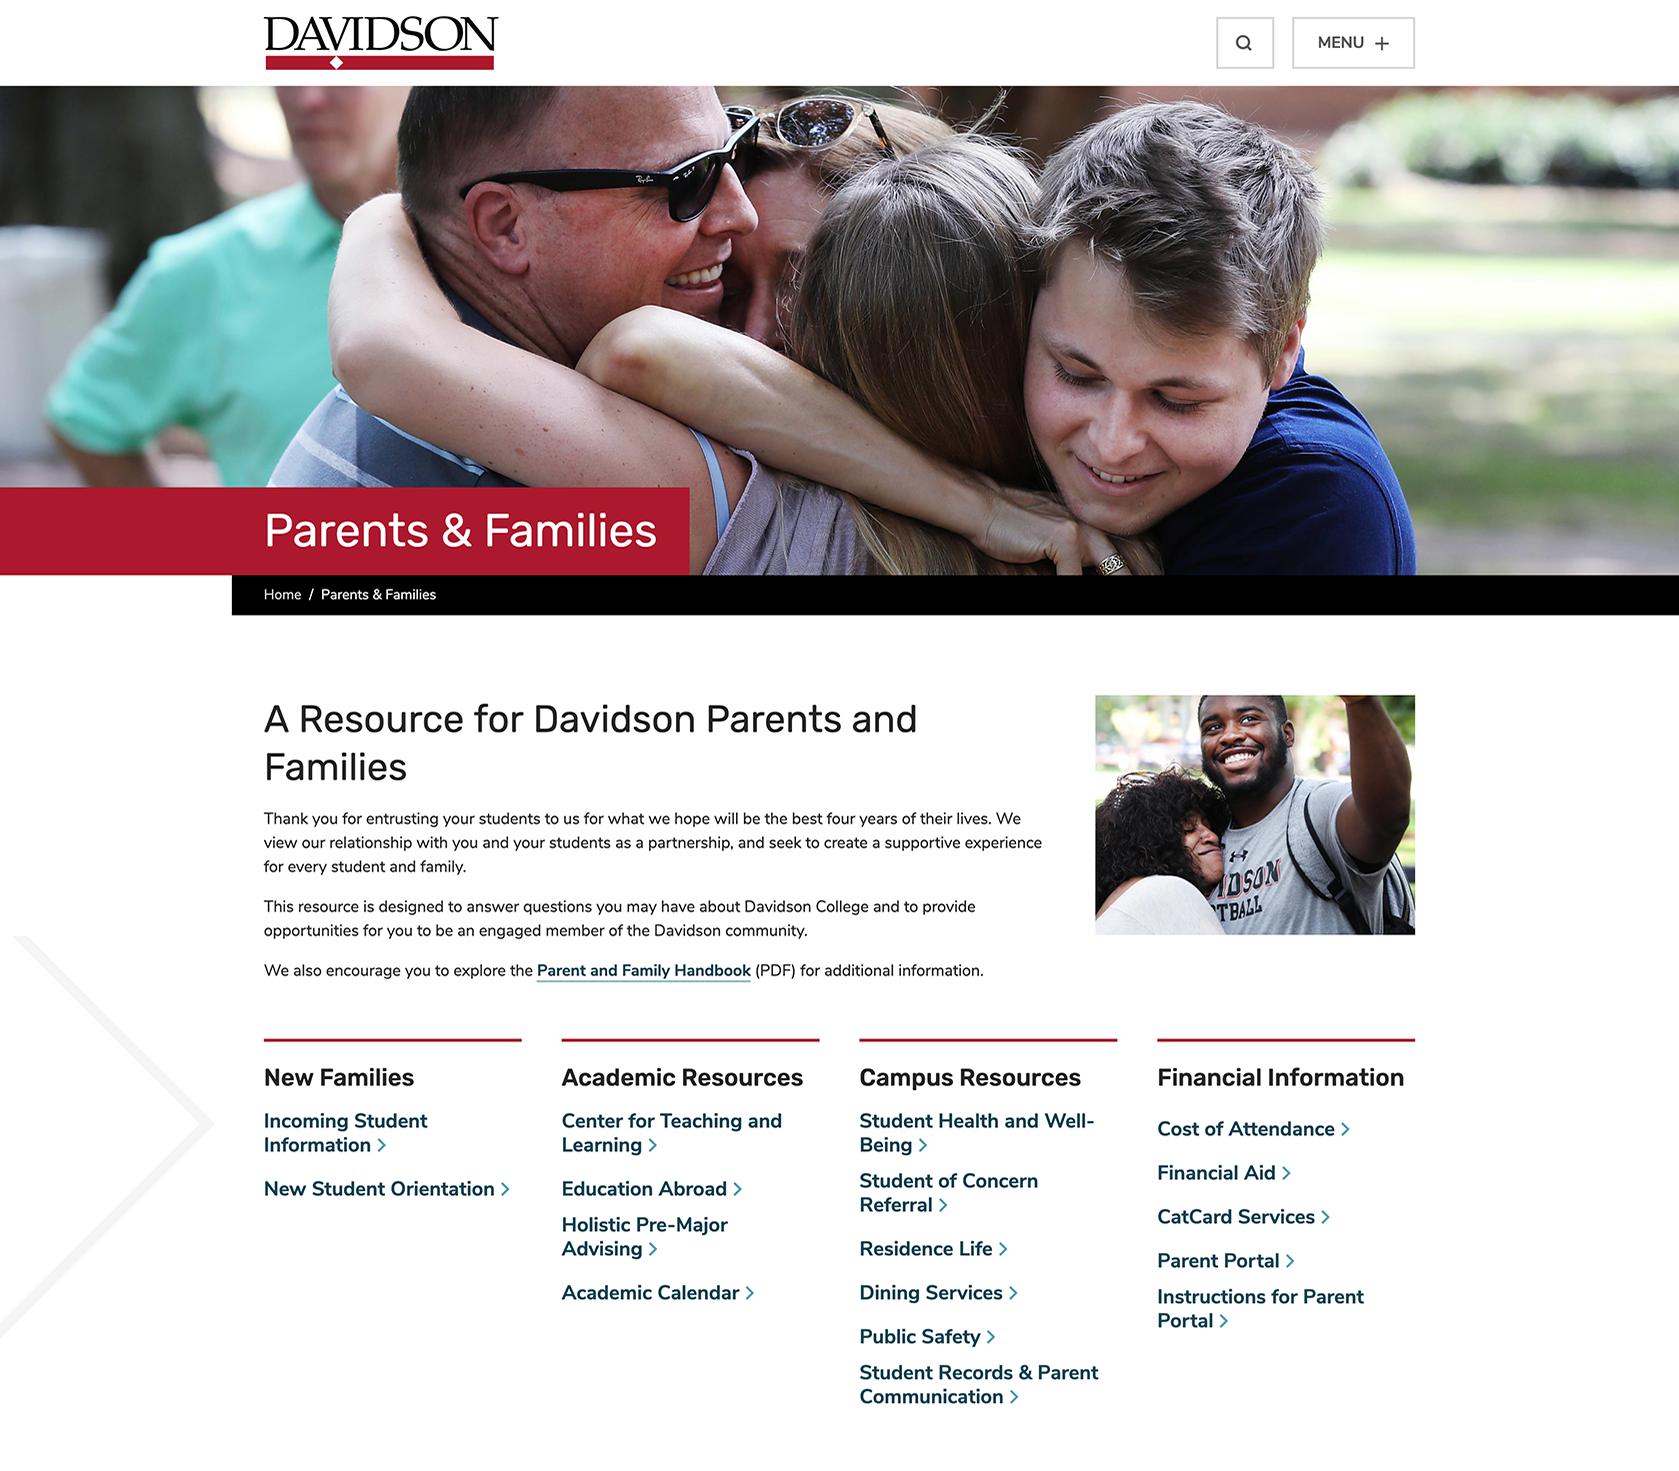 Screenshot of Parents & Families Gateway Page on Davidson.edu